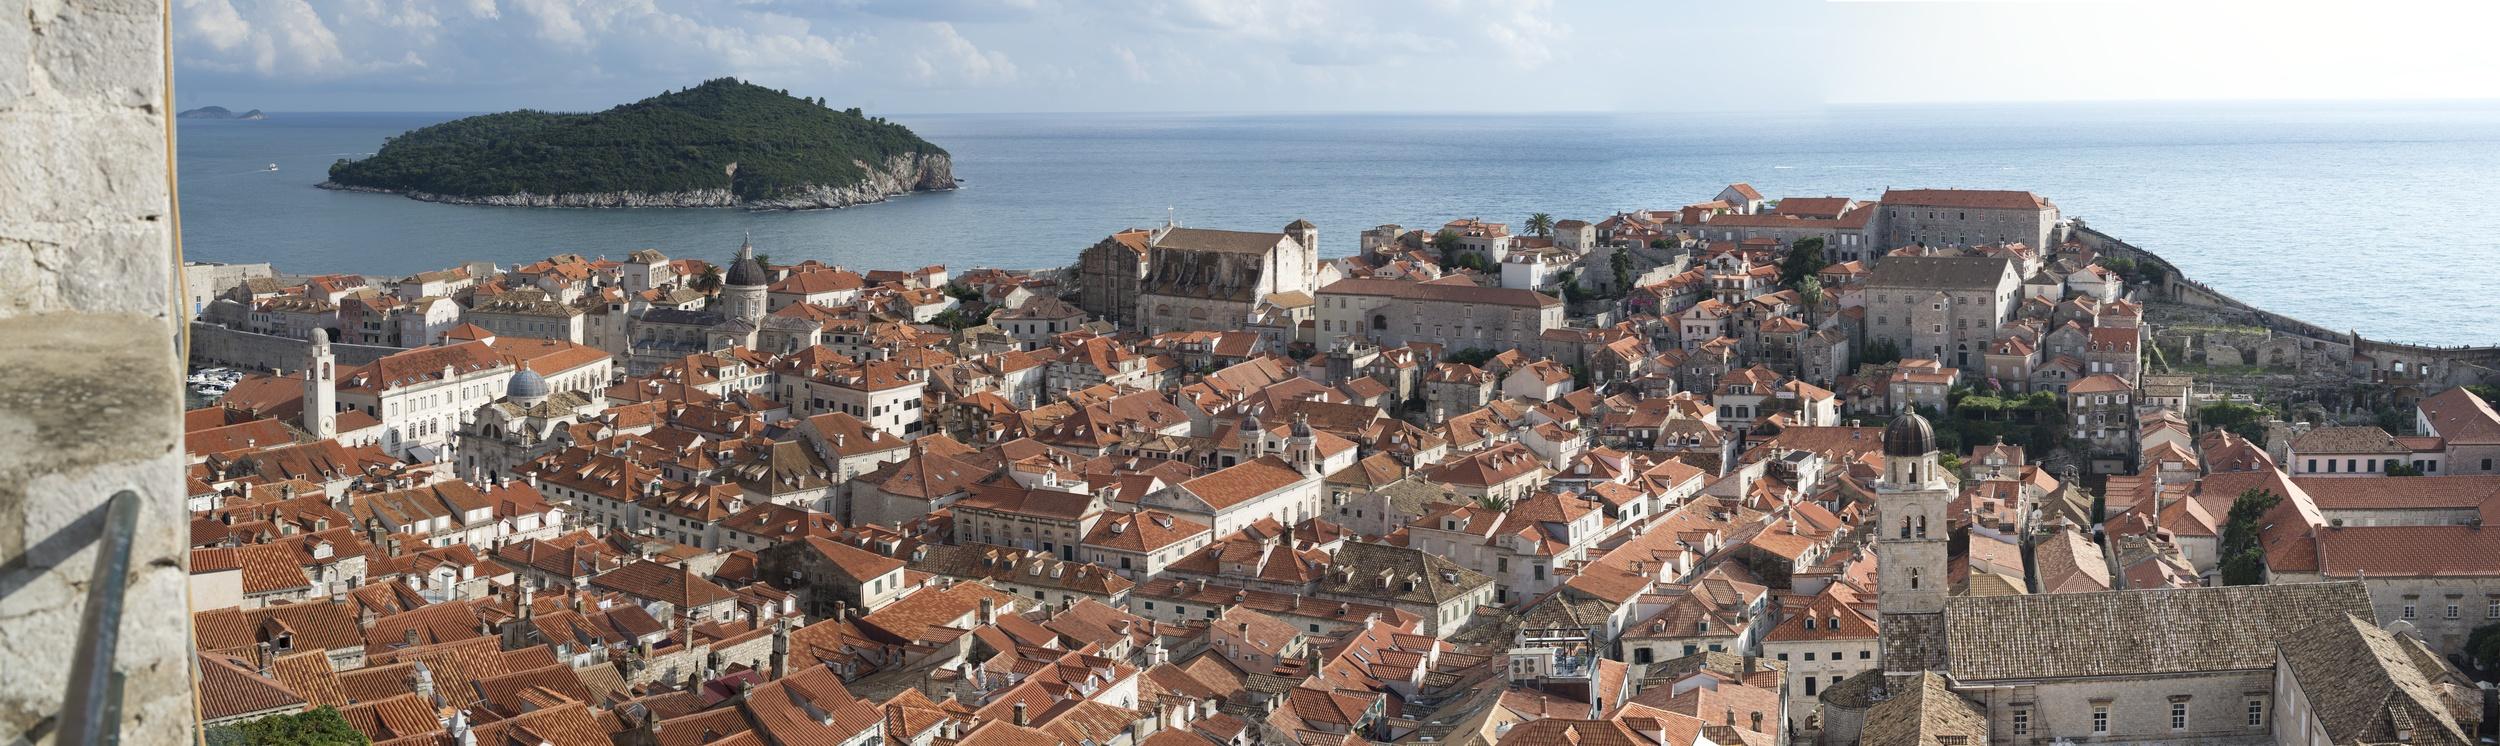 Dubrovnik_Pano1.jpg